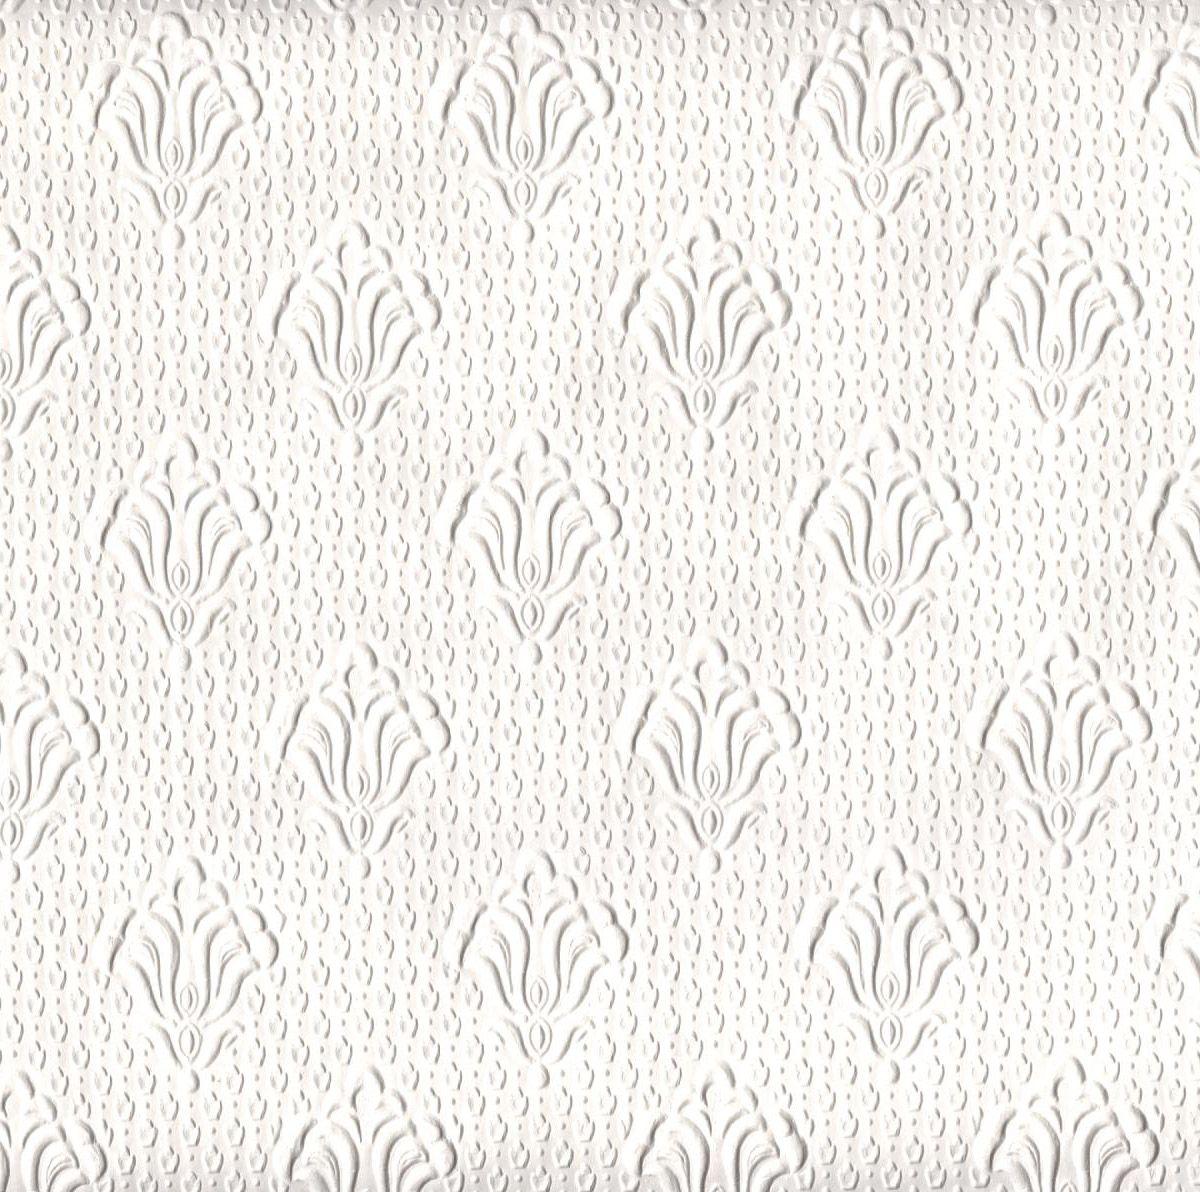 Anaglypta Wallpaper   VE669   Anaglypta and Lincrusta Wallpaper 1200x1192